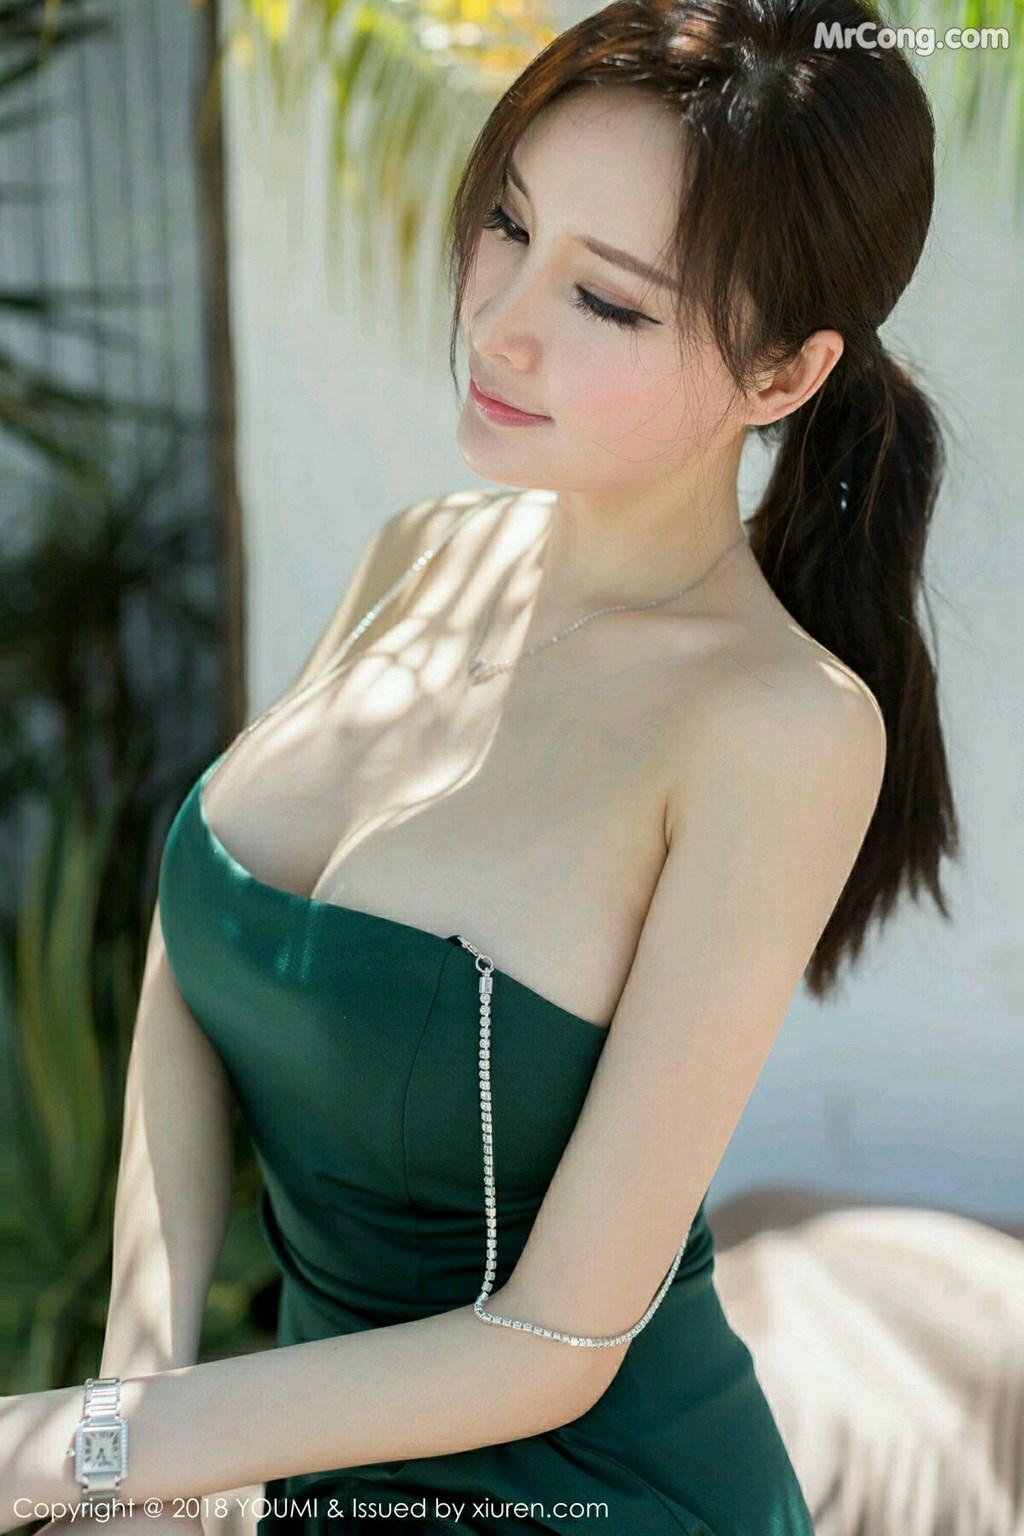 Image YouMi-Vol.188-Tu-Fei-Yuan-Ai-Cuo-Qiong-MrCong.com-023 in post YouMi Vol.188: Người mẫu 奶瓶土肥圆 (52 ảnh)